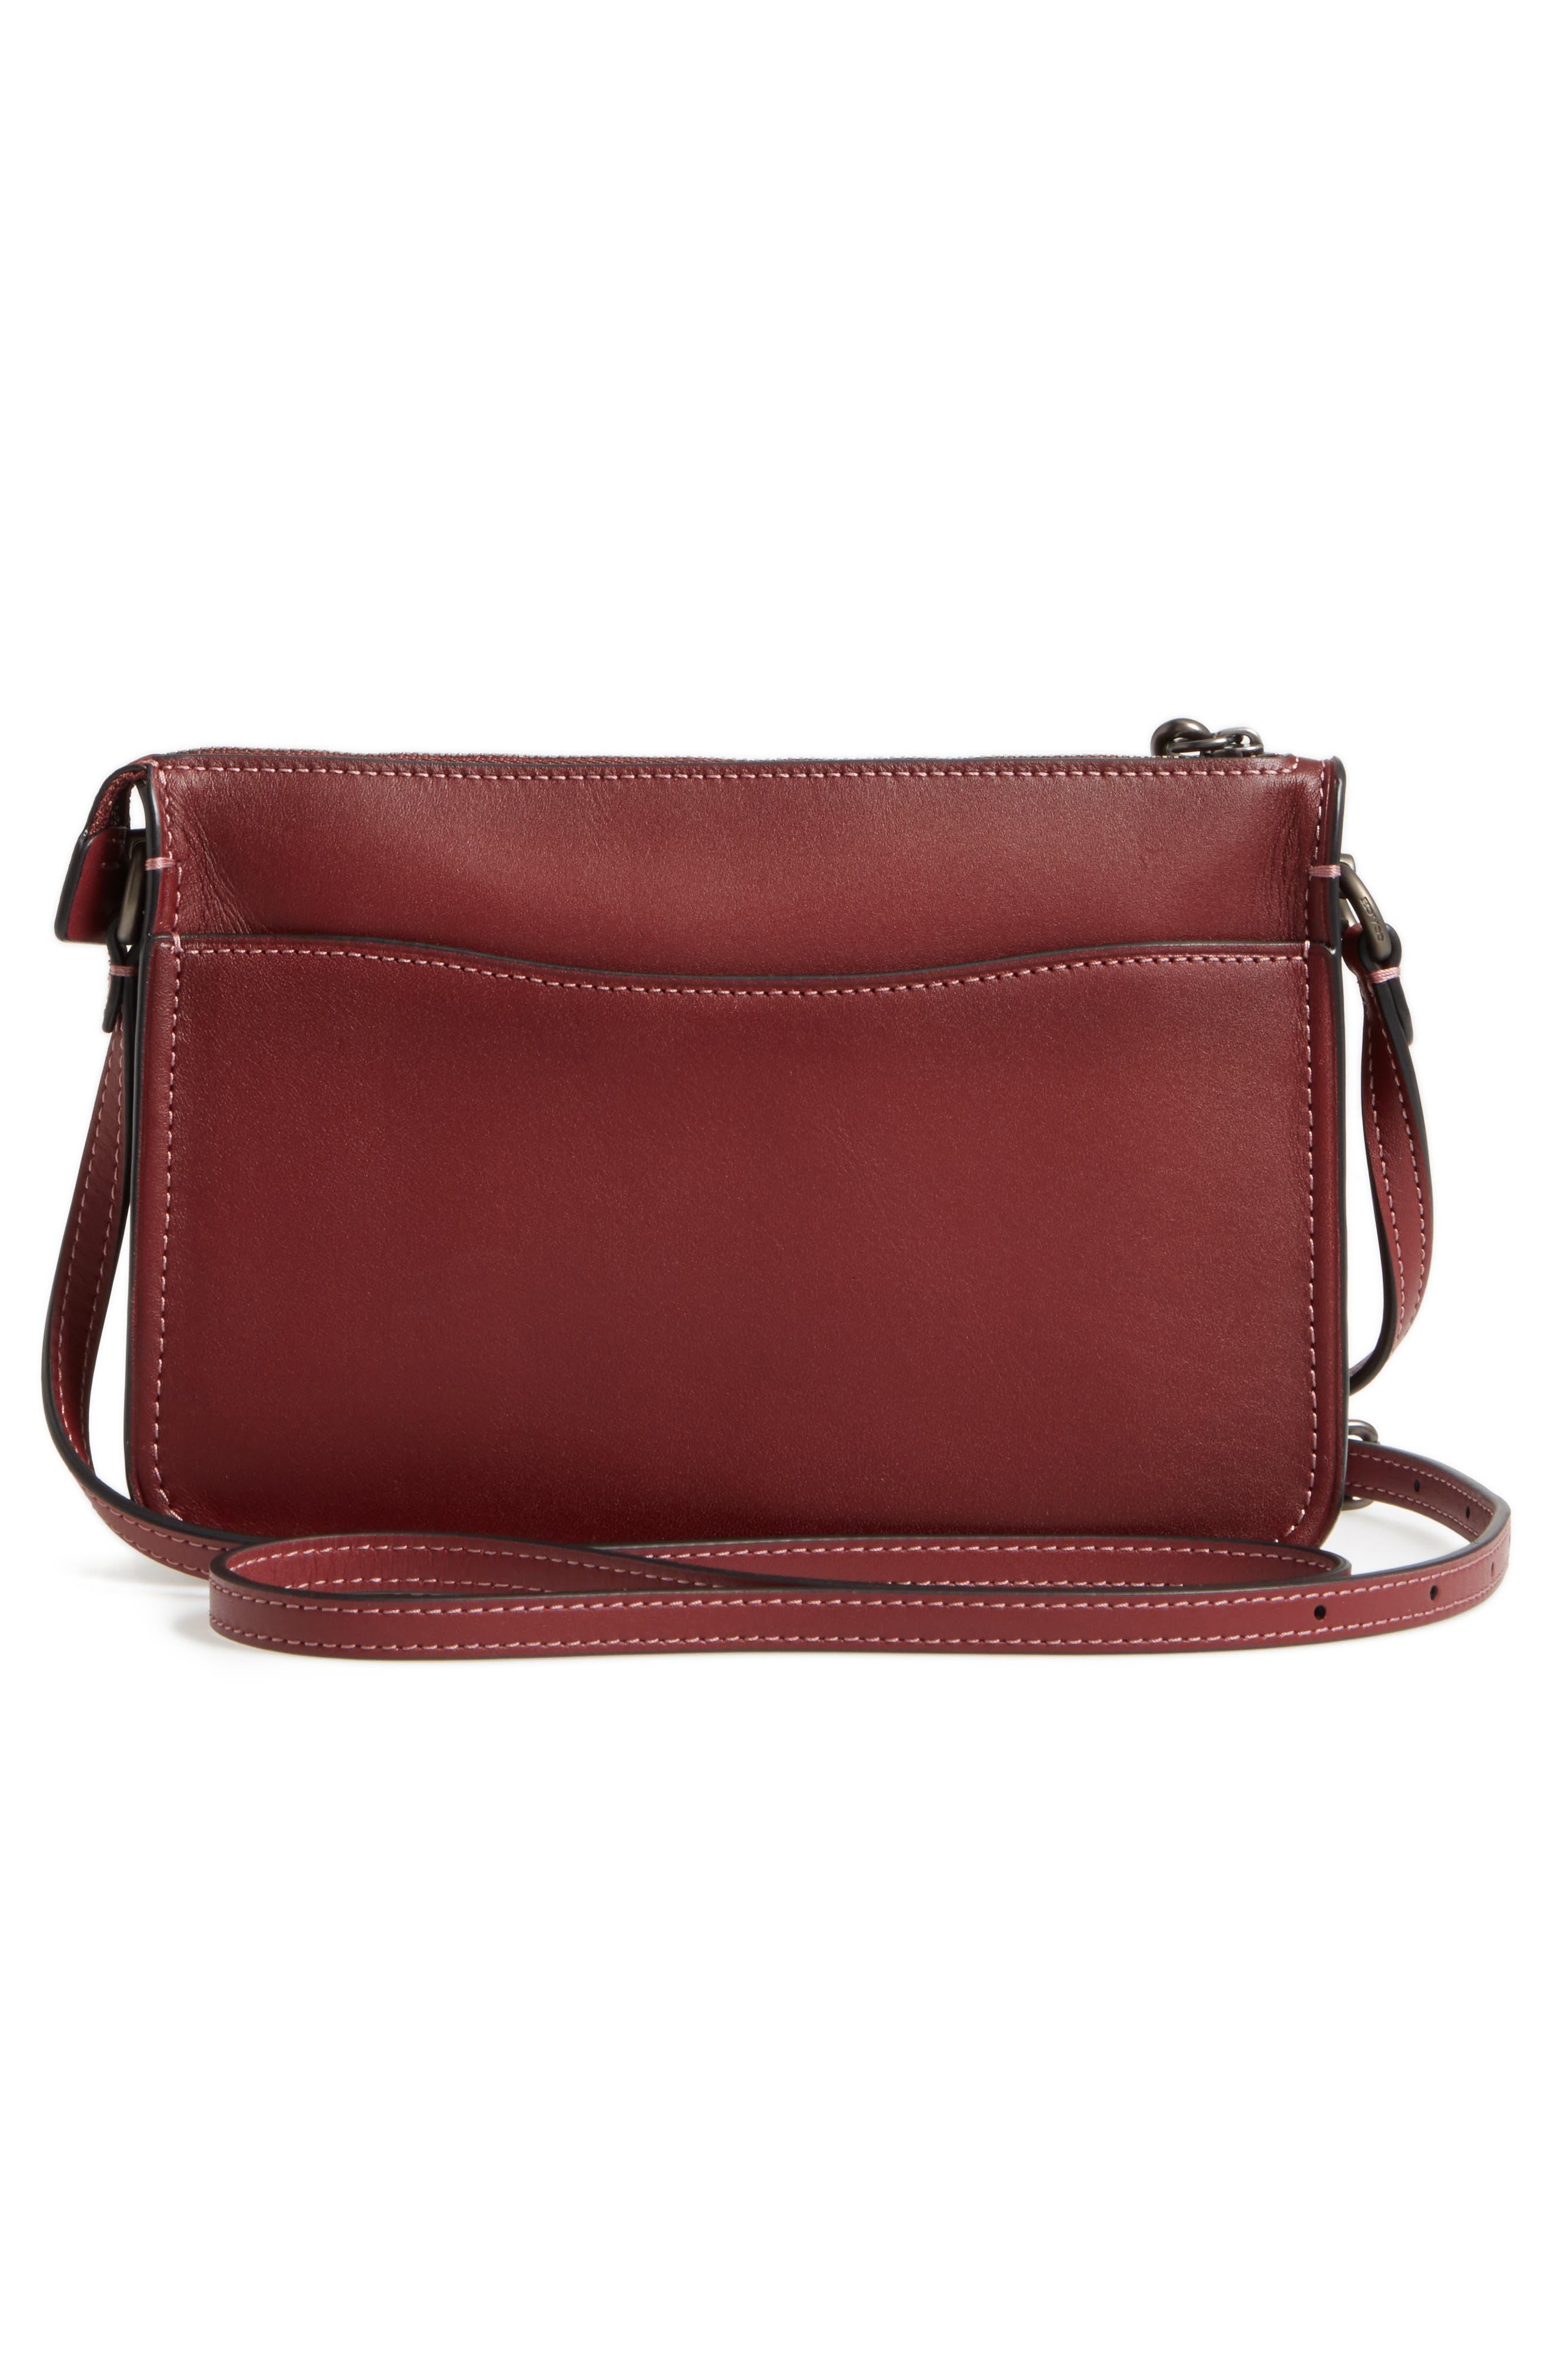 Soho Leather Crossbody Bag,                             Alternate thumbnail 3, color,                             614